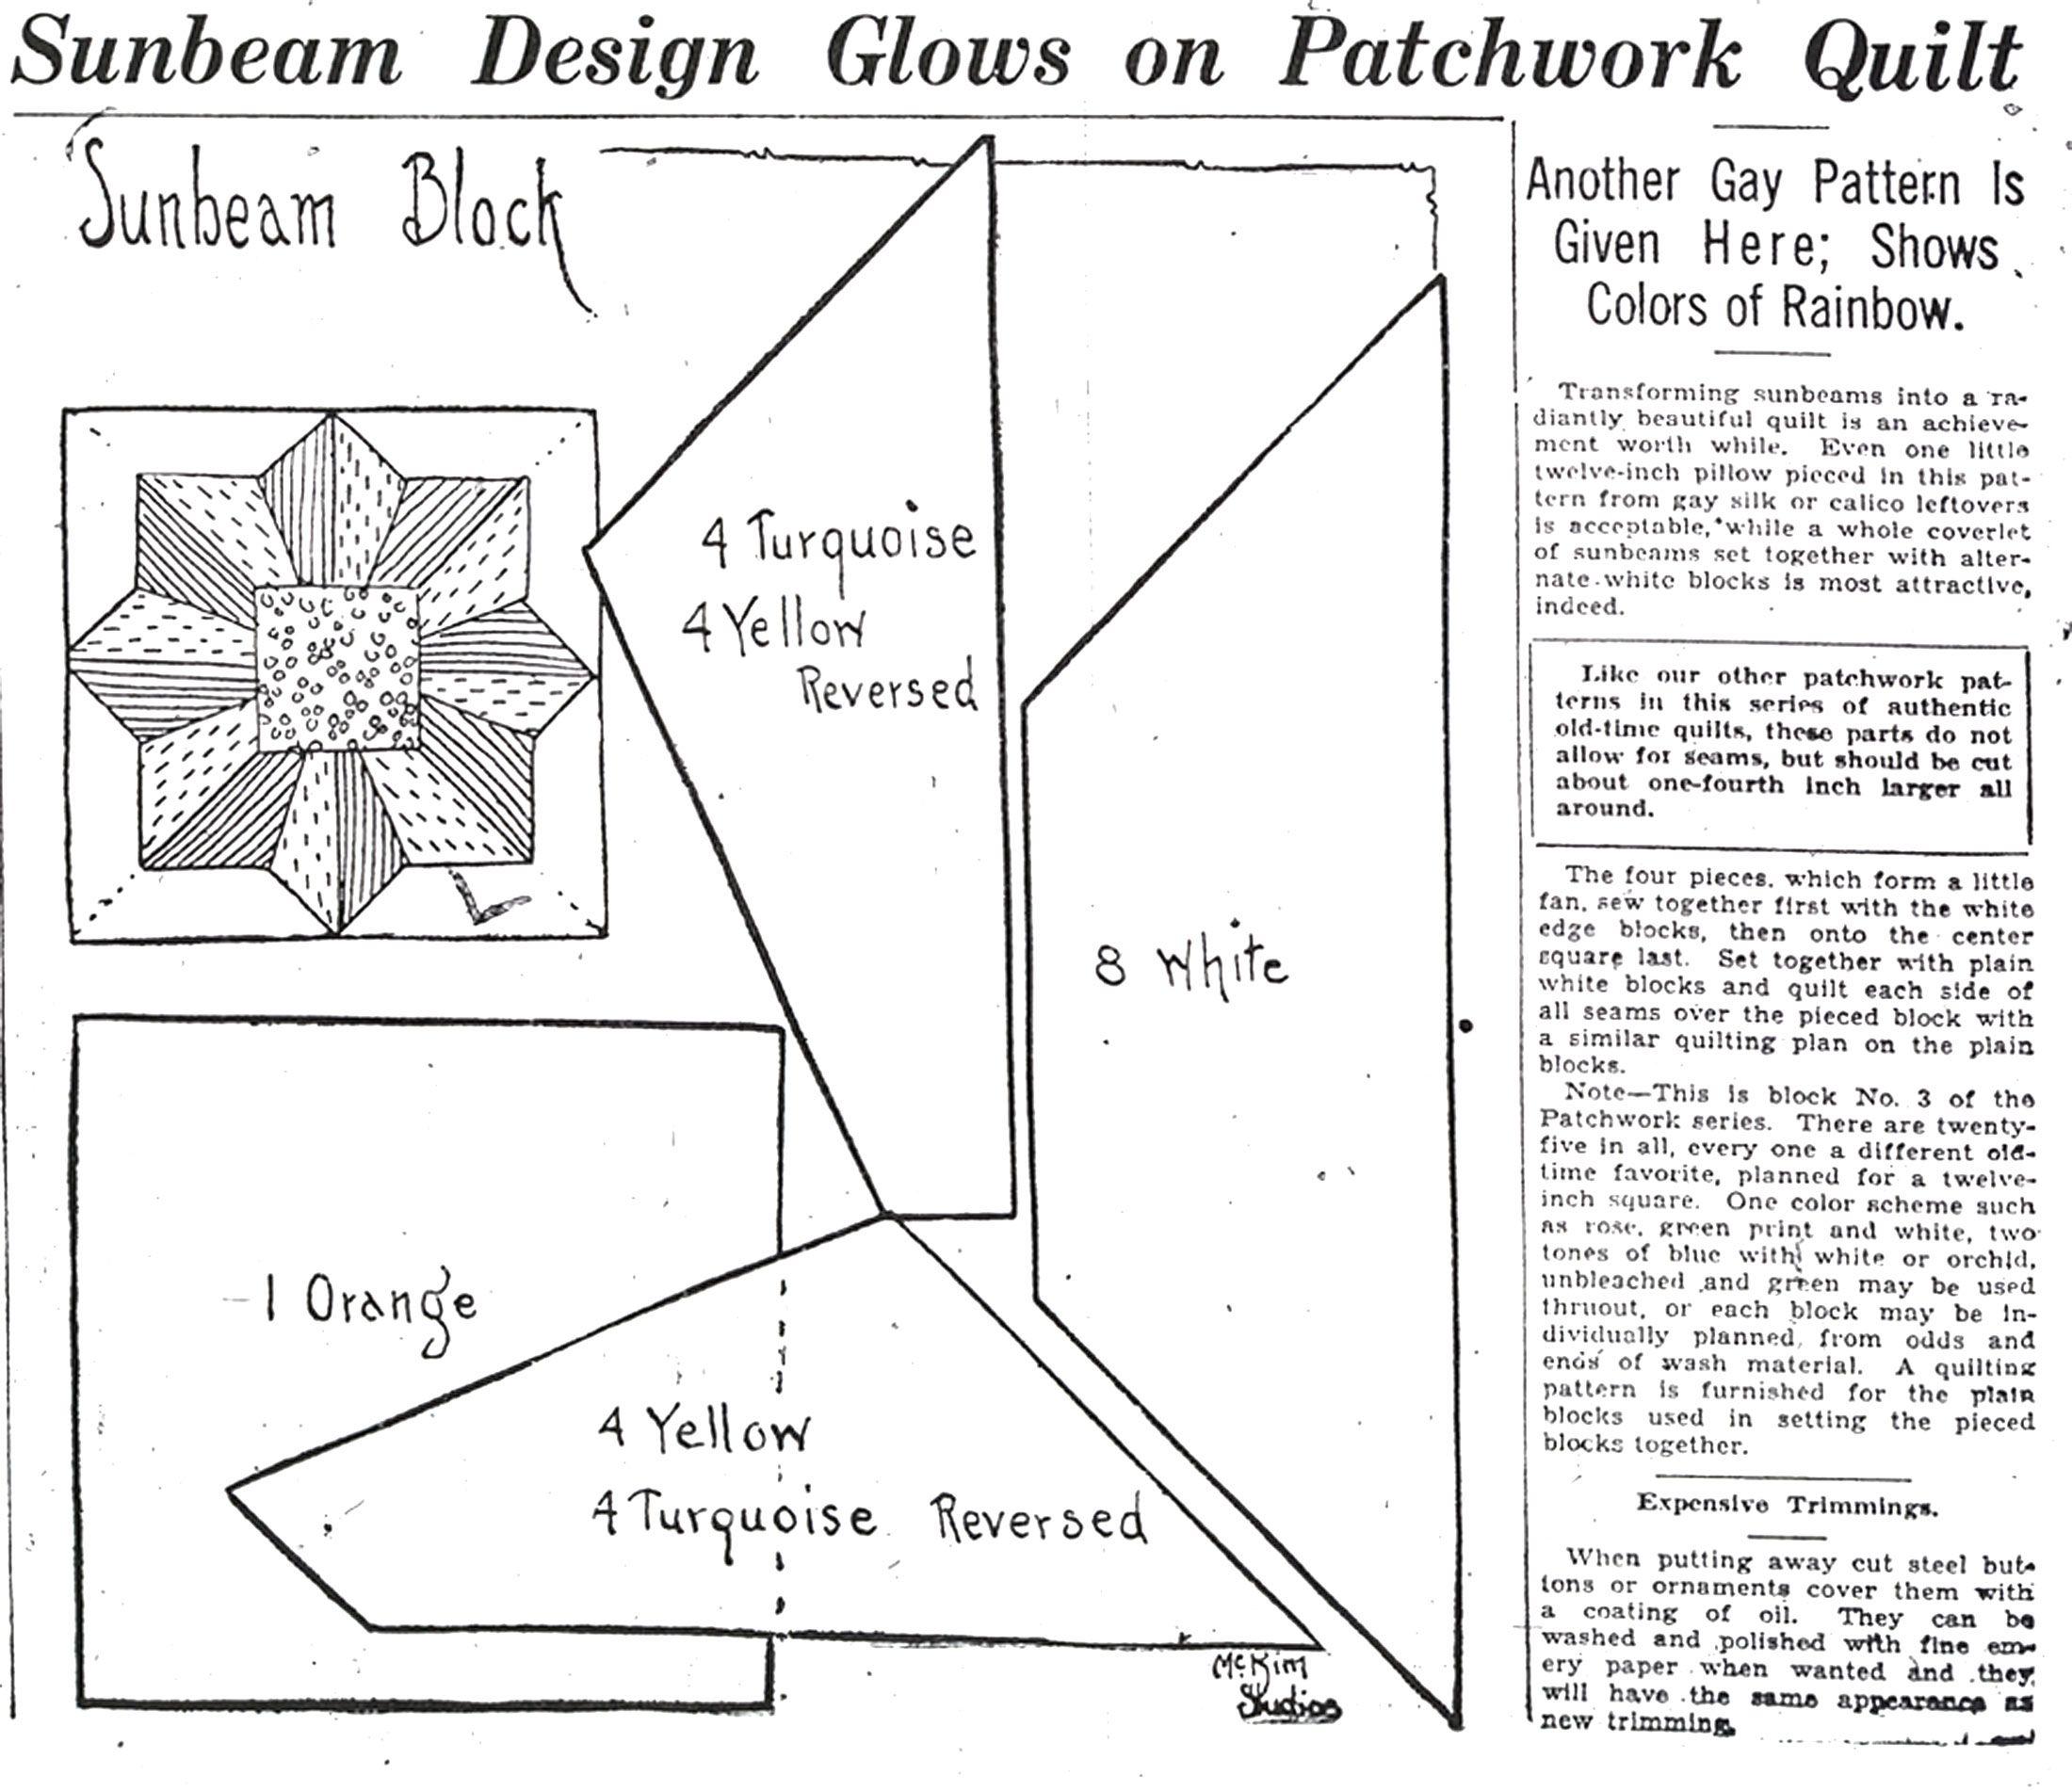 Patchwork Quilt series: Sunbeam pattern   Quilt blocks   Pinterest ...